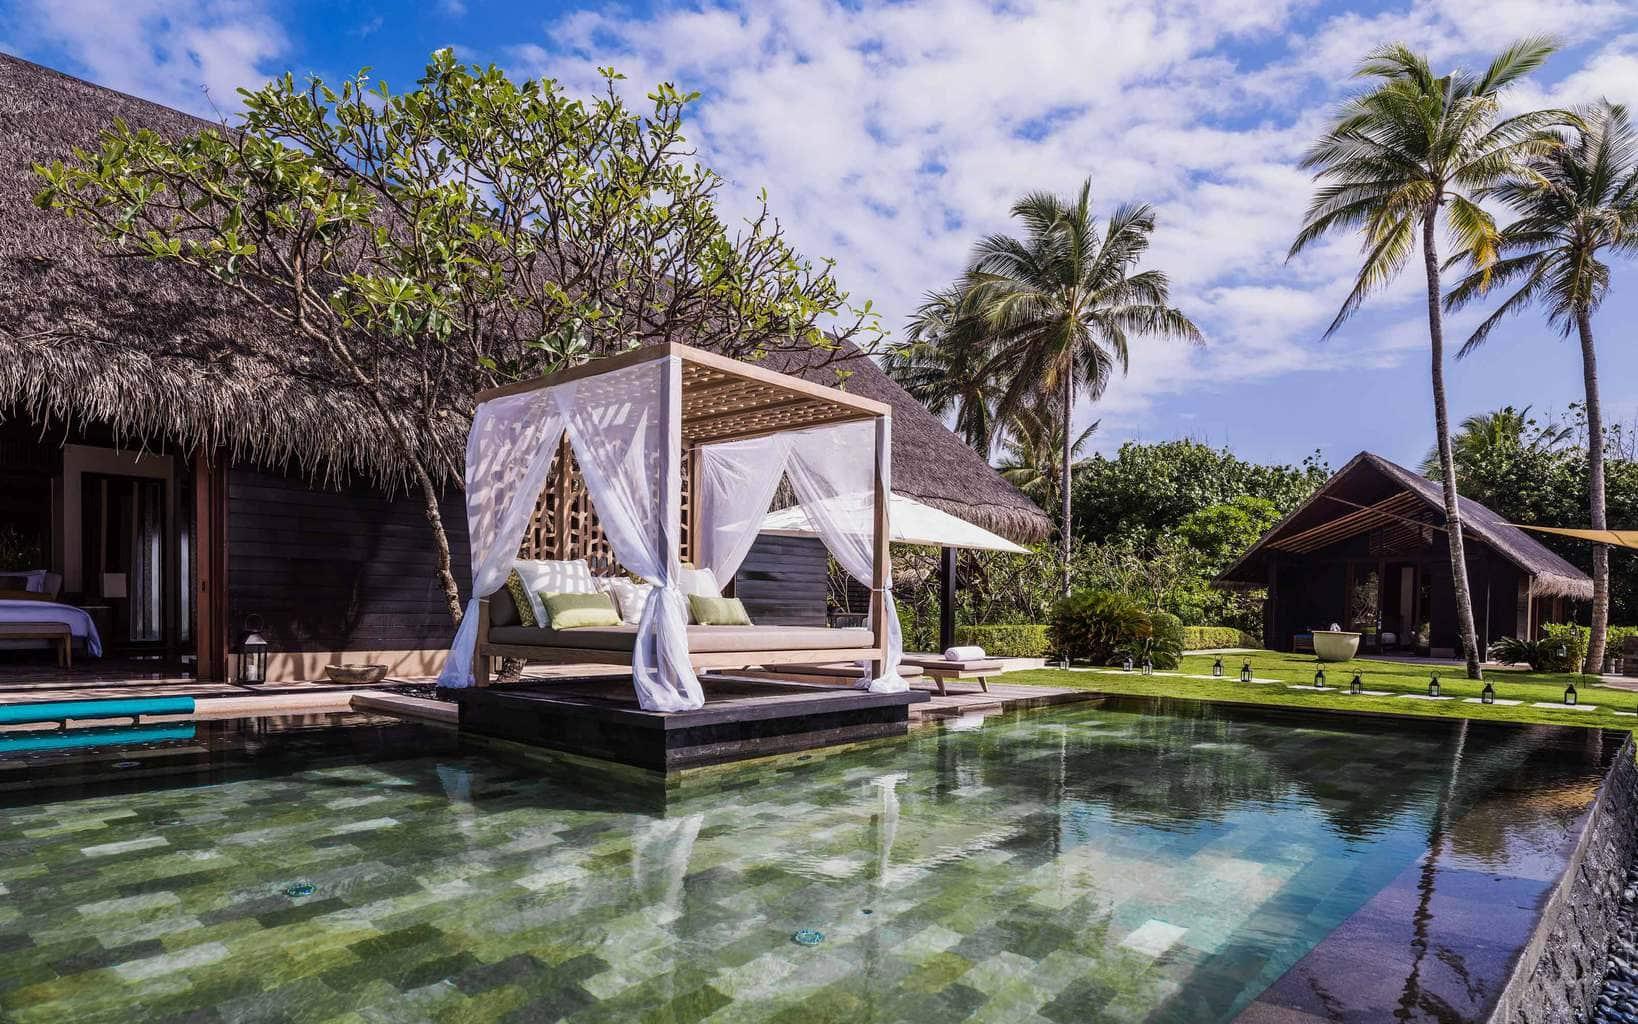 Oneandonly Reethi Rah Grand Sunset Residence pool